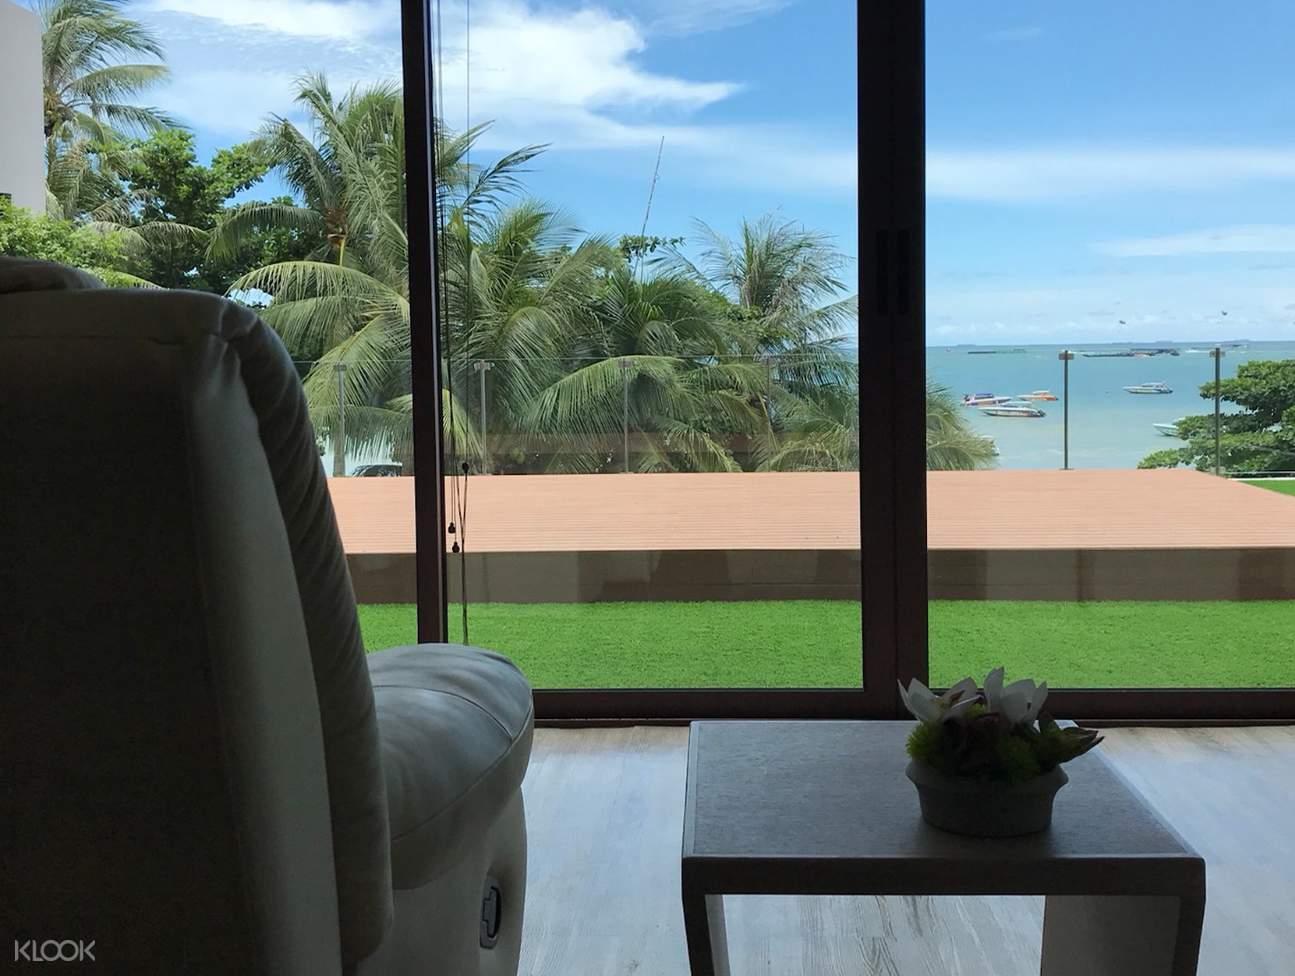 lets relax spa pattaya thailand